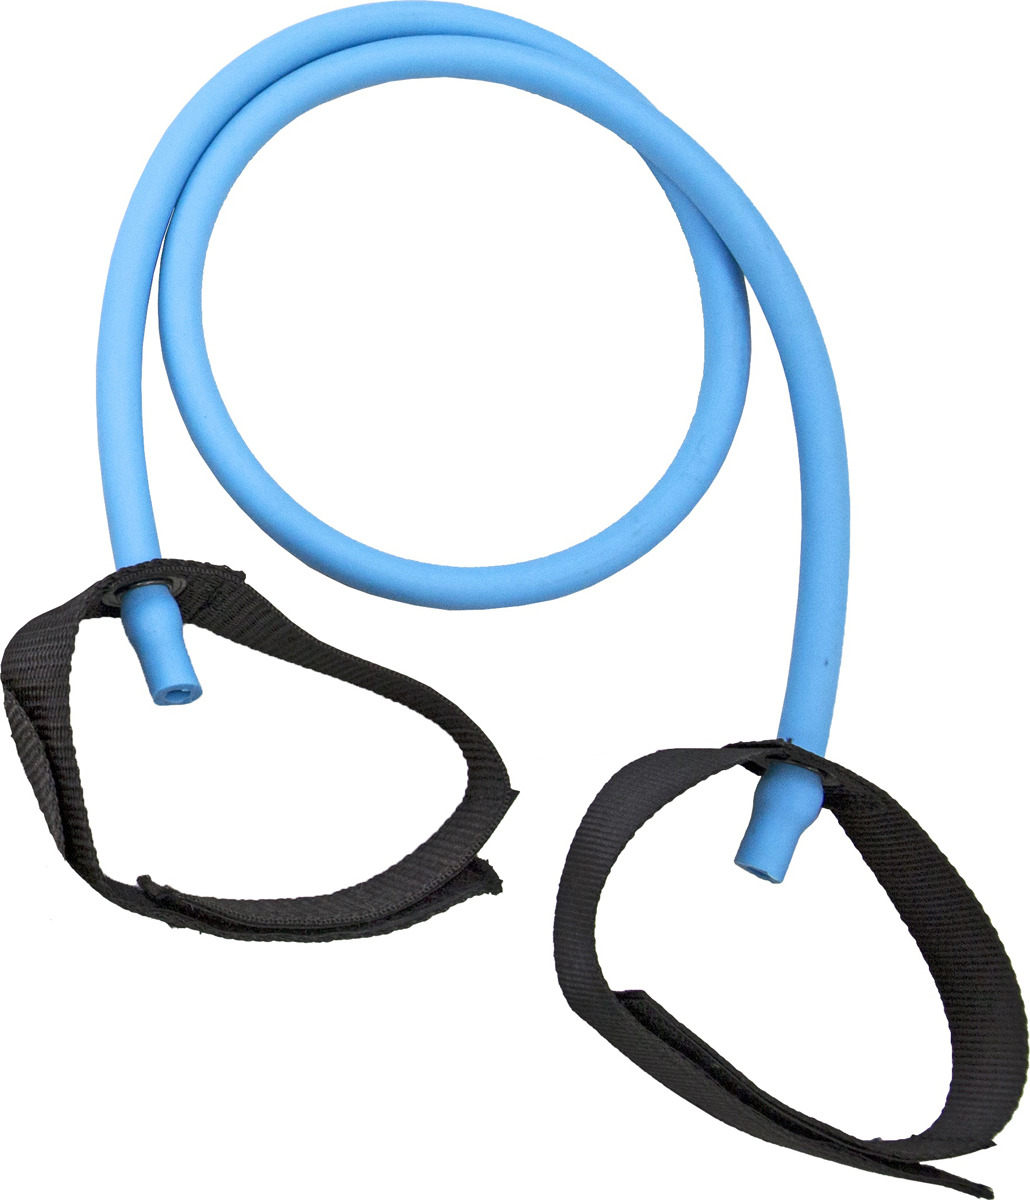 Эспандер Absolute Champion Т-1, 4690337036597, синий, для груди, 50 см эспандер absolute champion с разборной ручкой